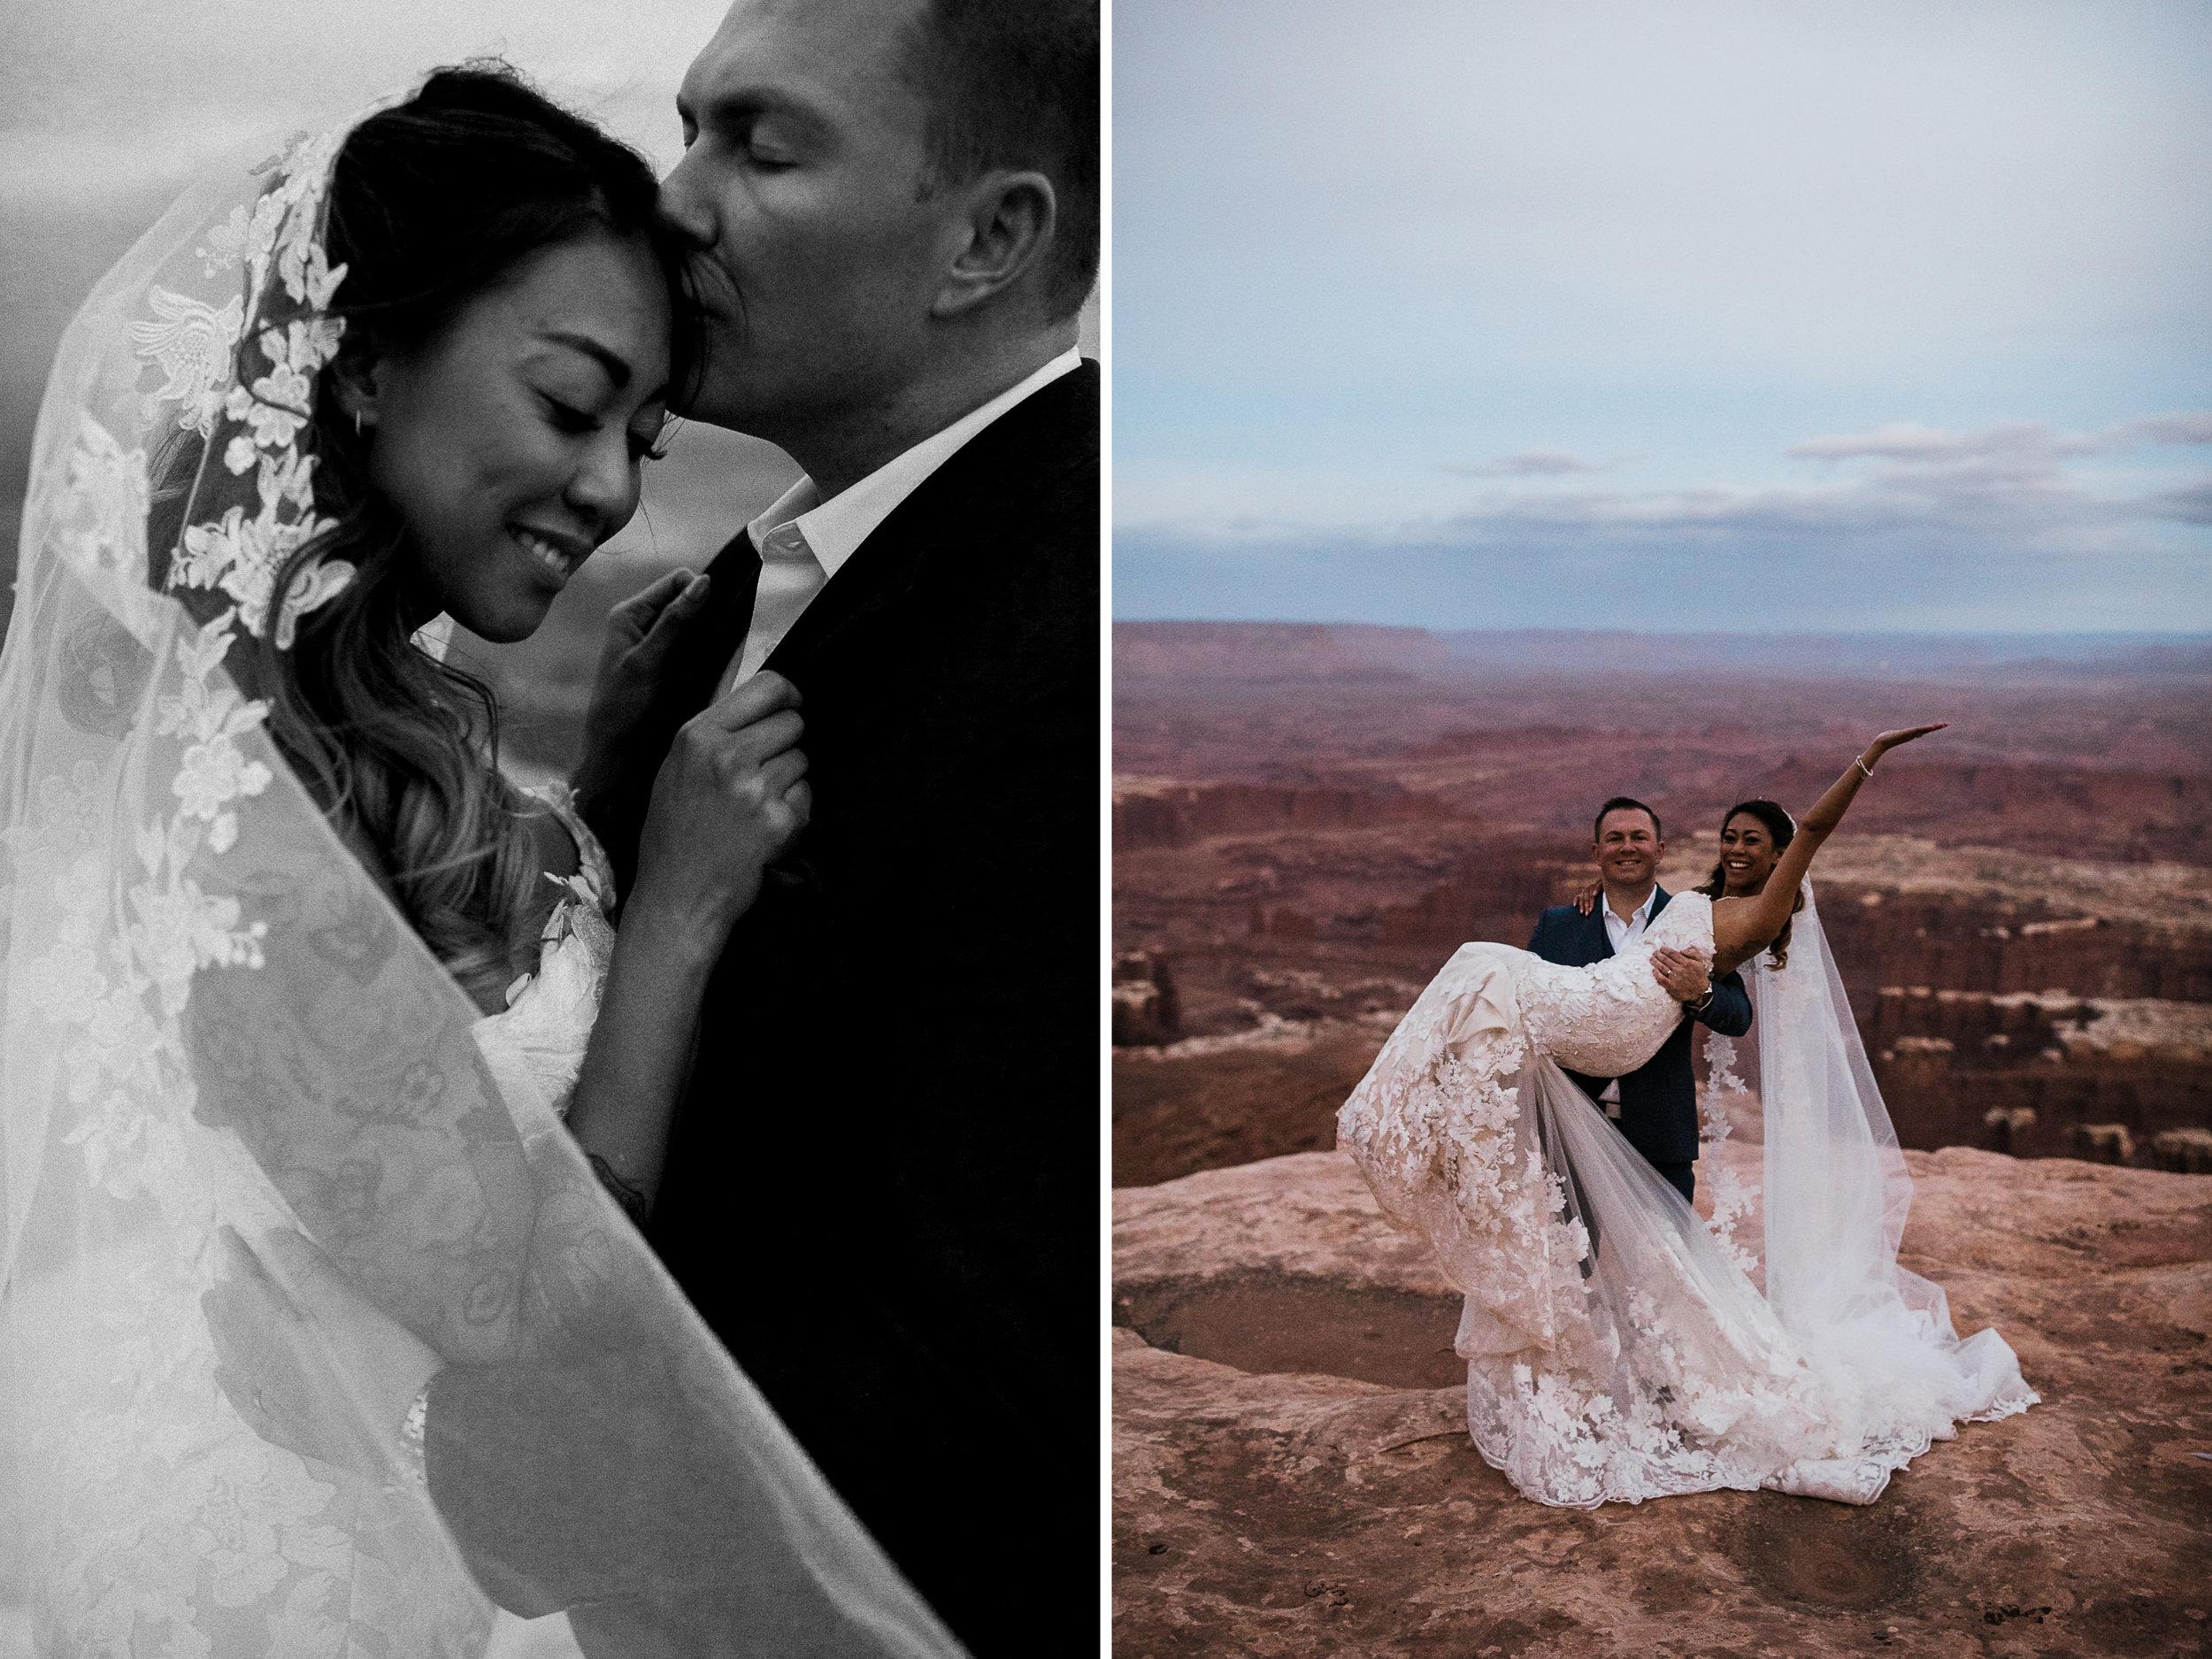 elopement wedding canyonlands national park near moab utah   adventurous desert wedding inspiration   small wedding in utah   the hearnes adventure photography